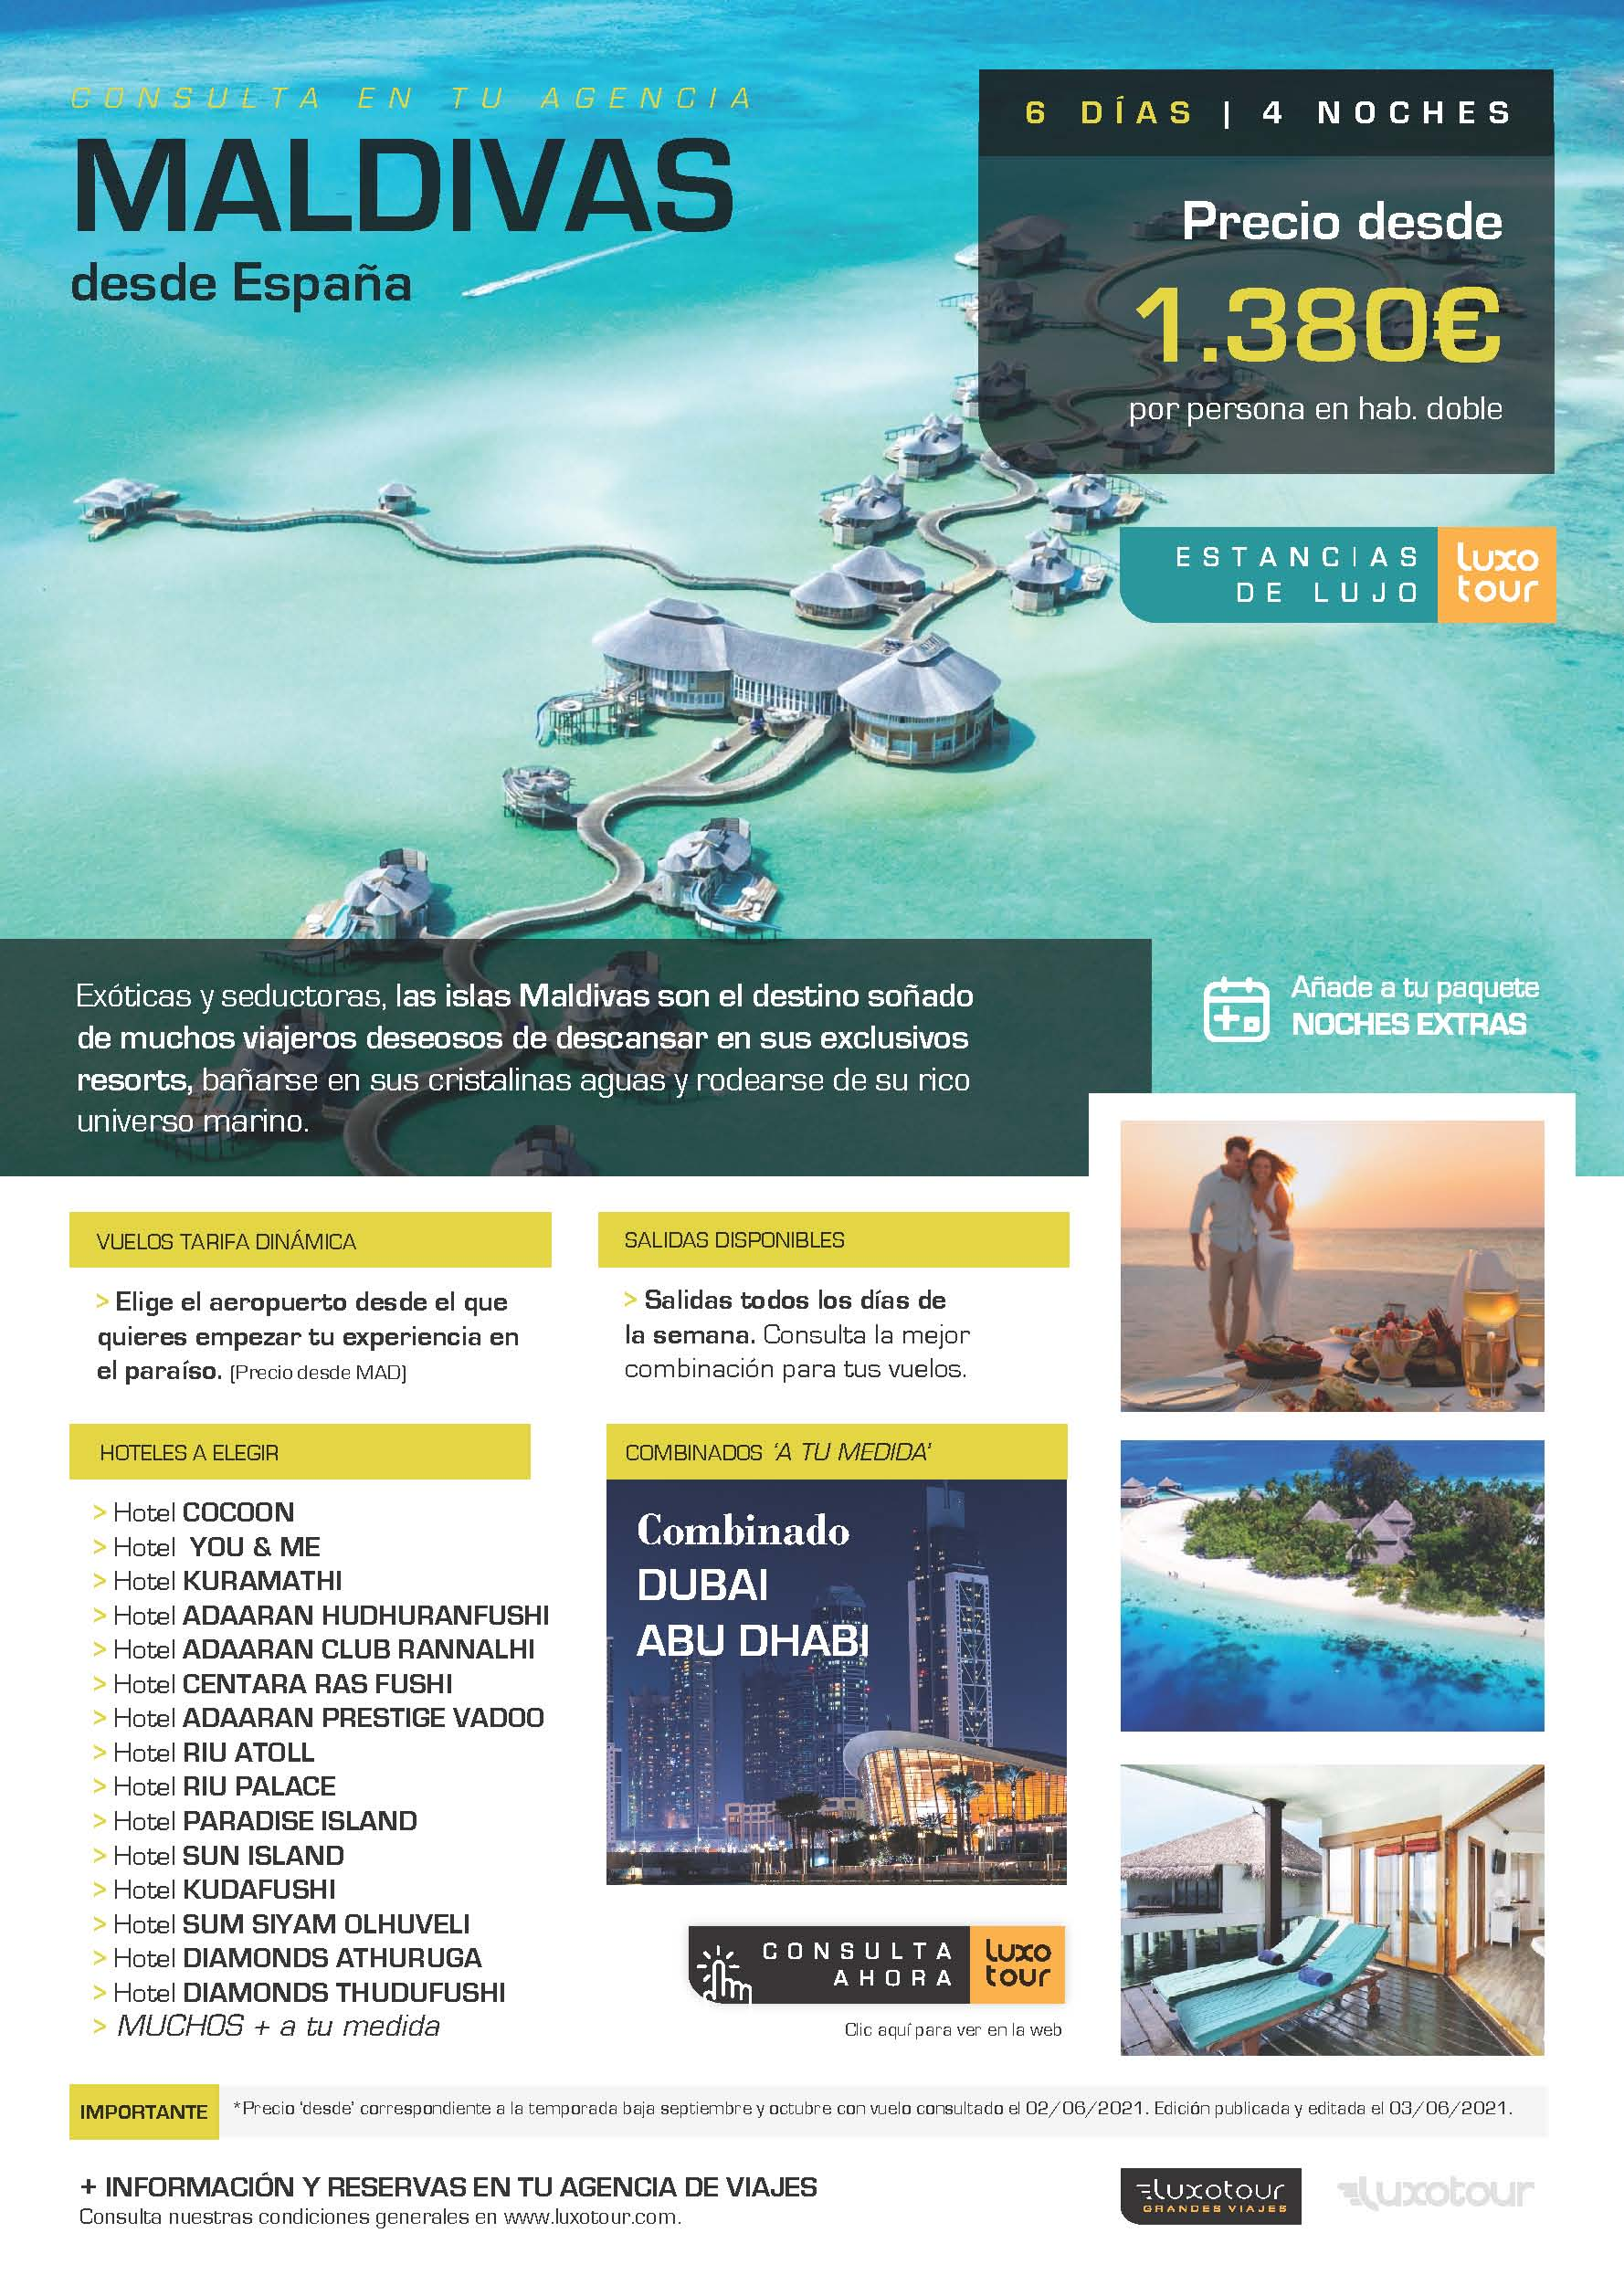 Oferta Luxotour Maldivas Verano y Otono 2021